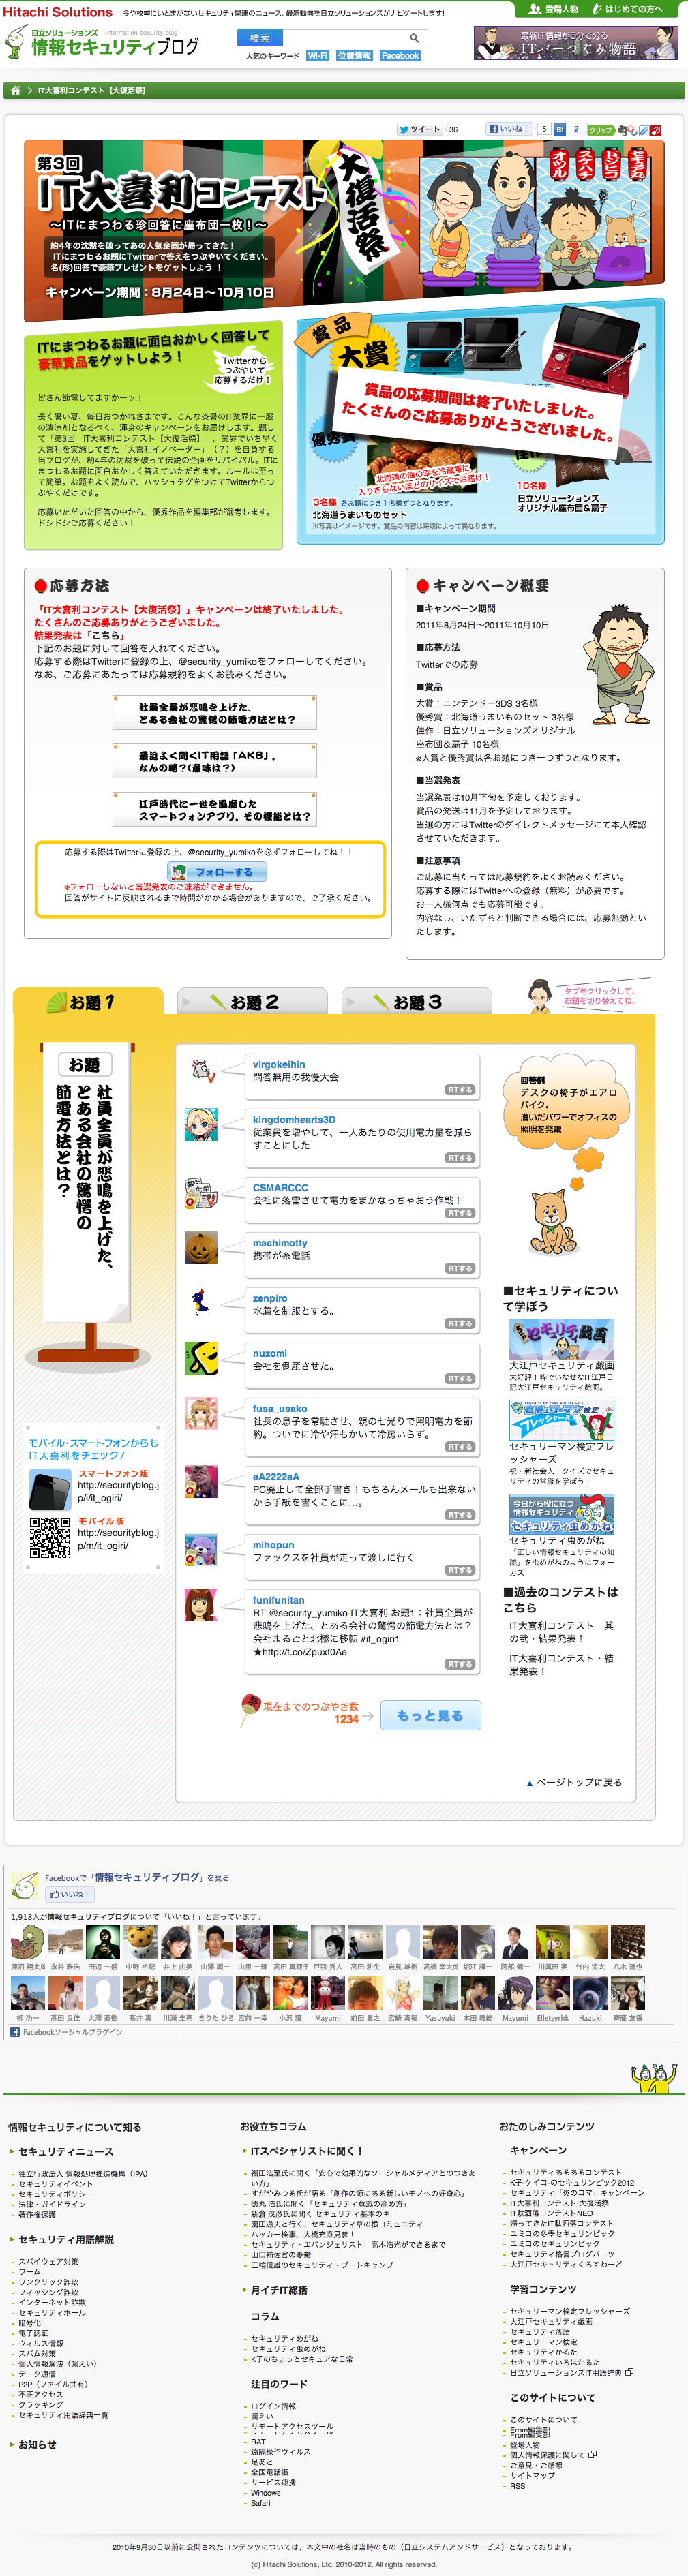 IT大喜利コンテスト【大復活祭】   日立ソリューションズの情報セキュリティブログ